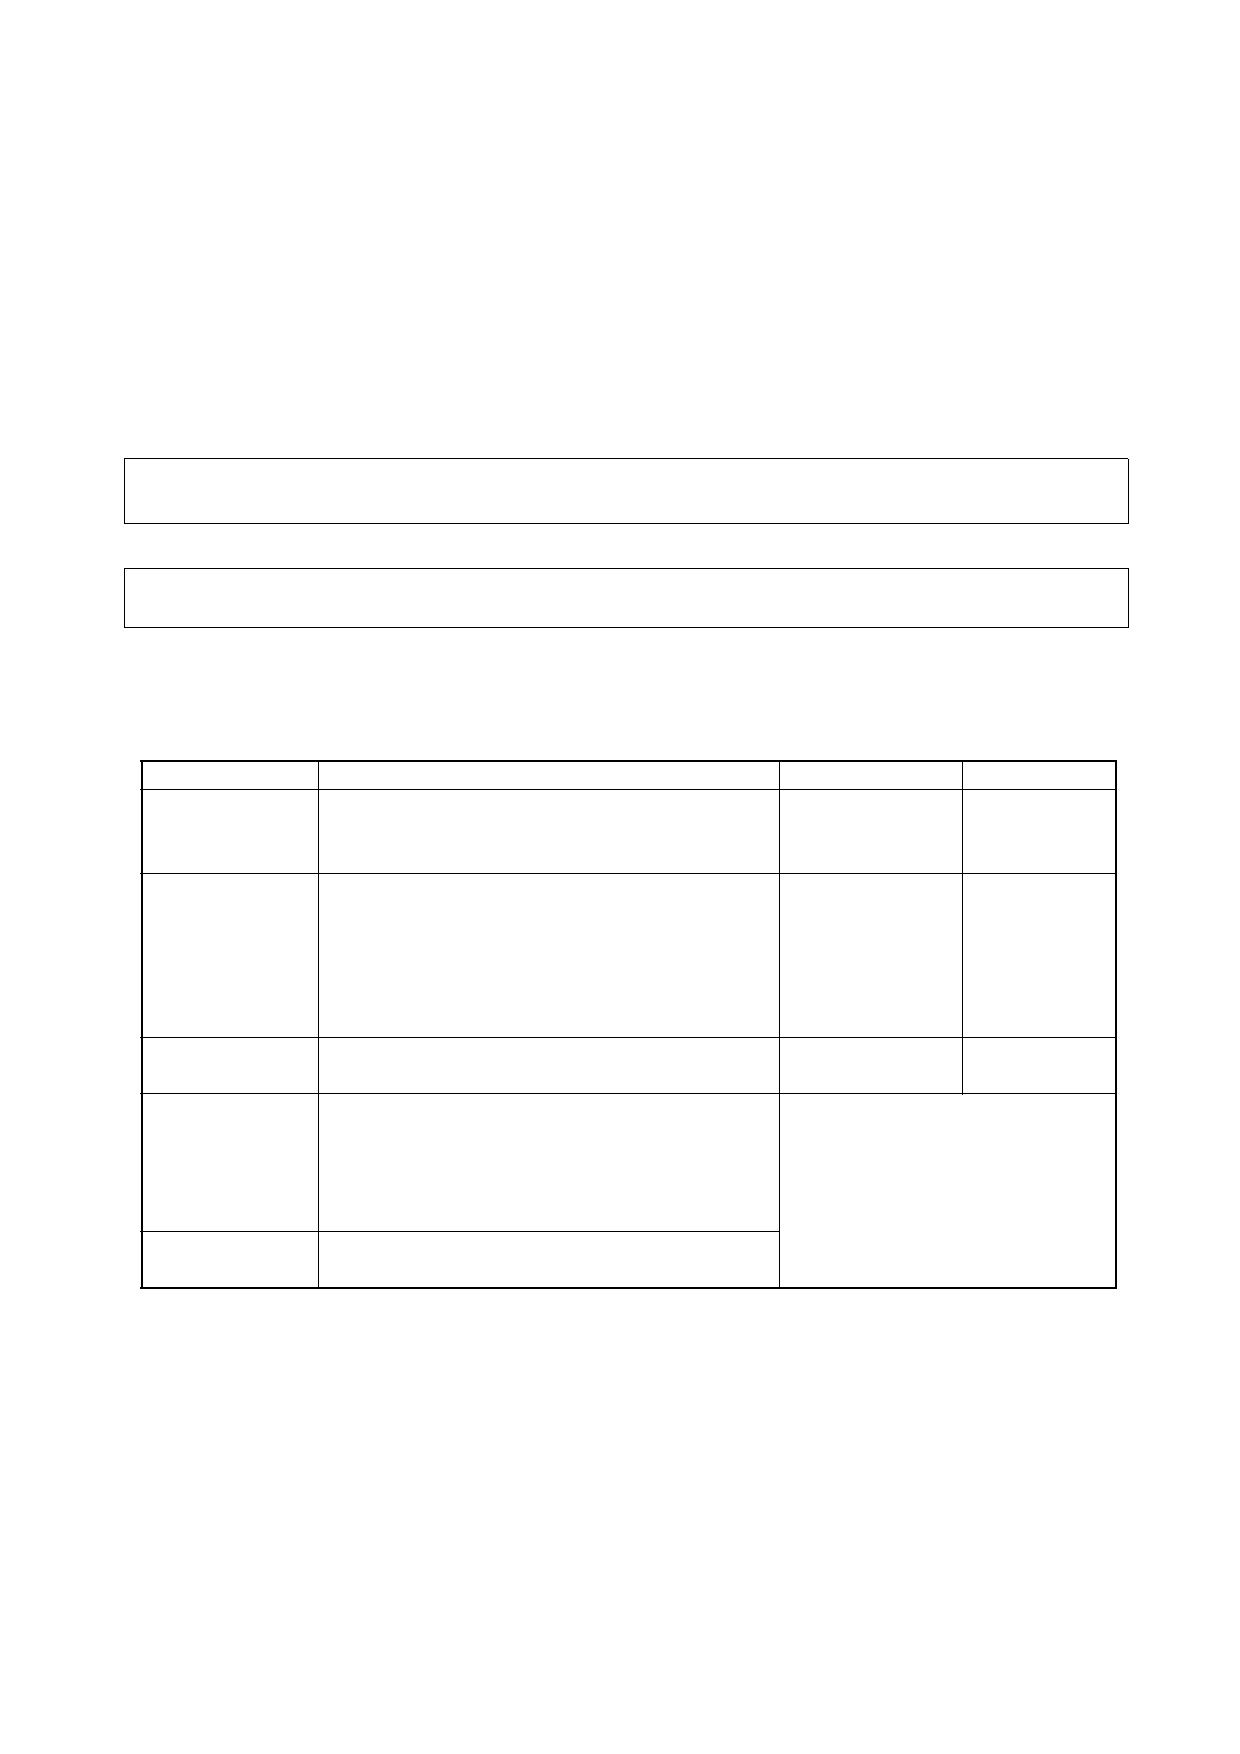 R5F21218KFP pdf, 반도체, 판매, 대치품